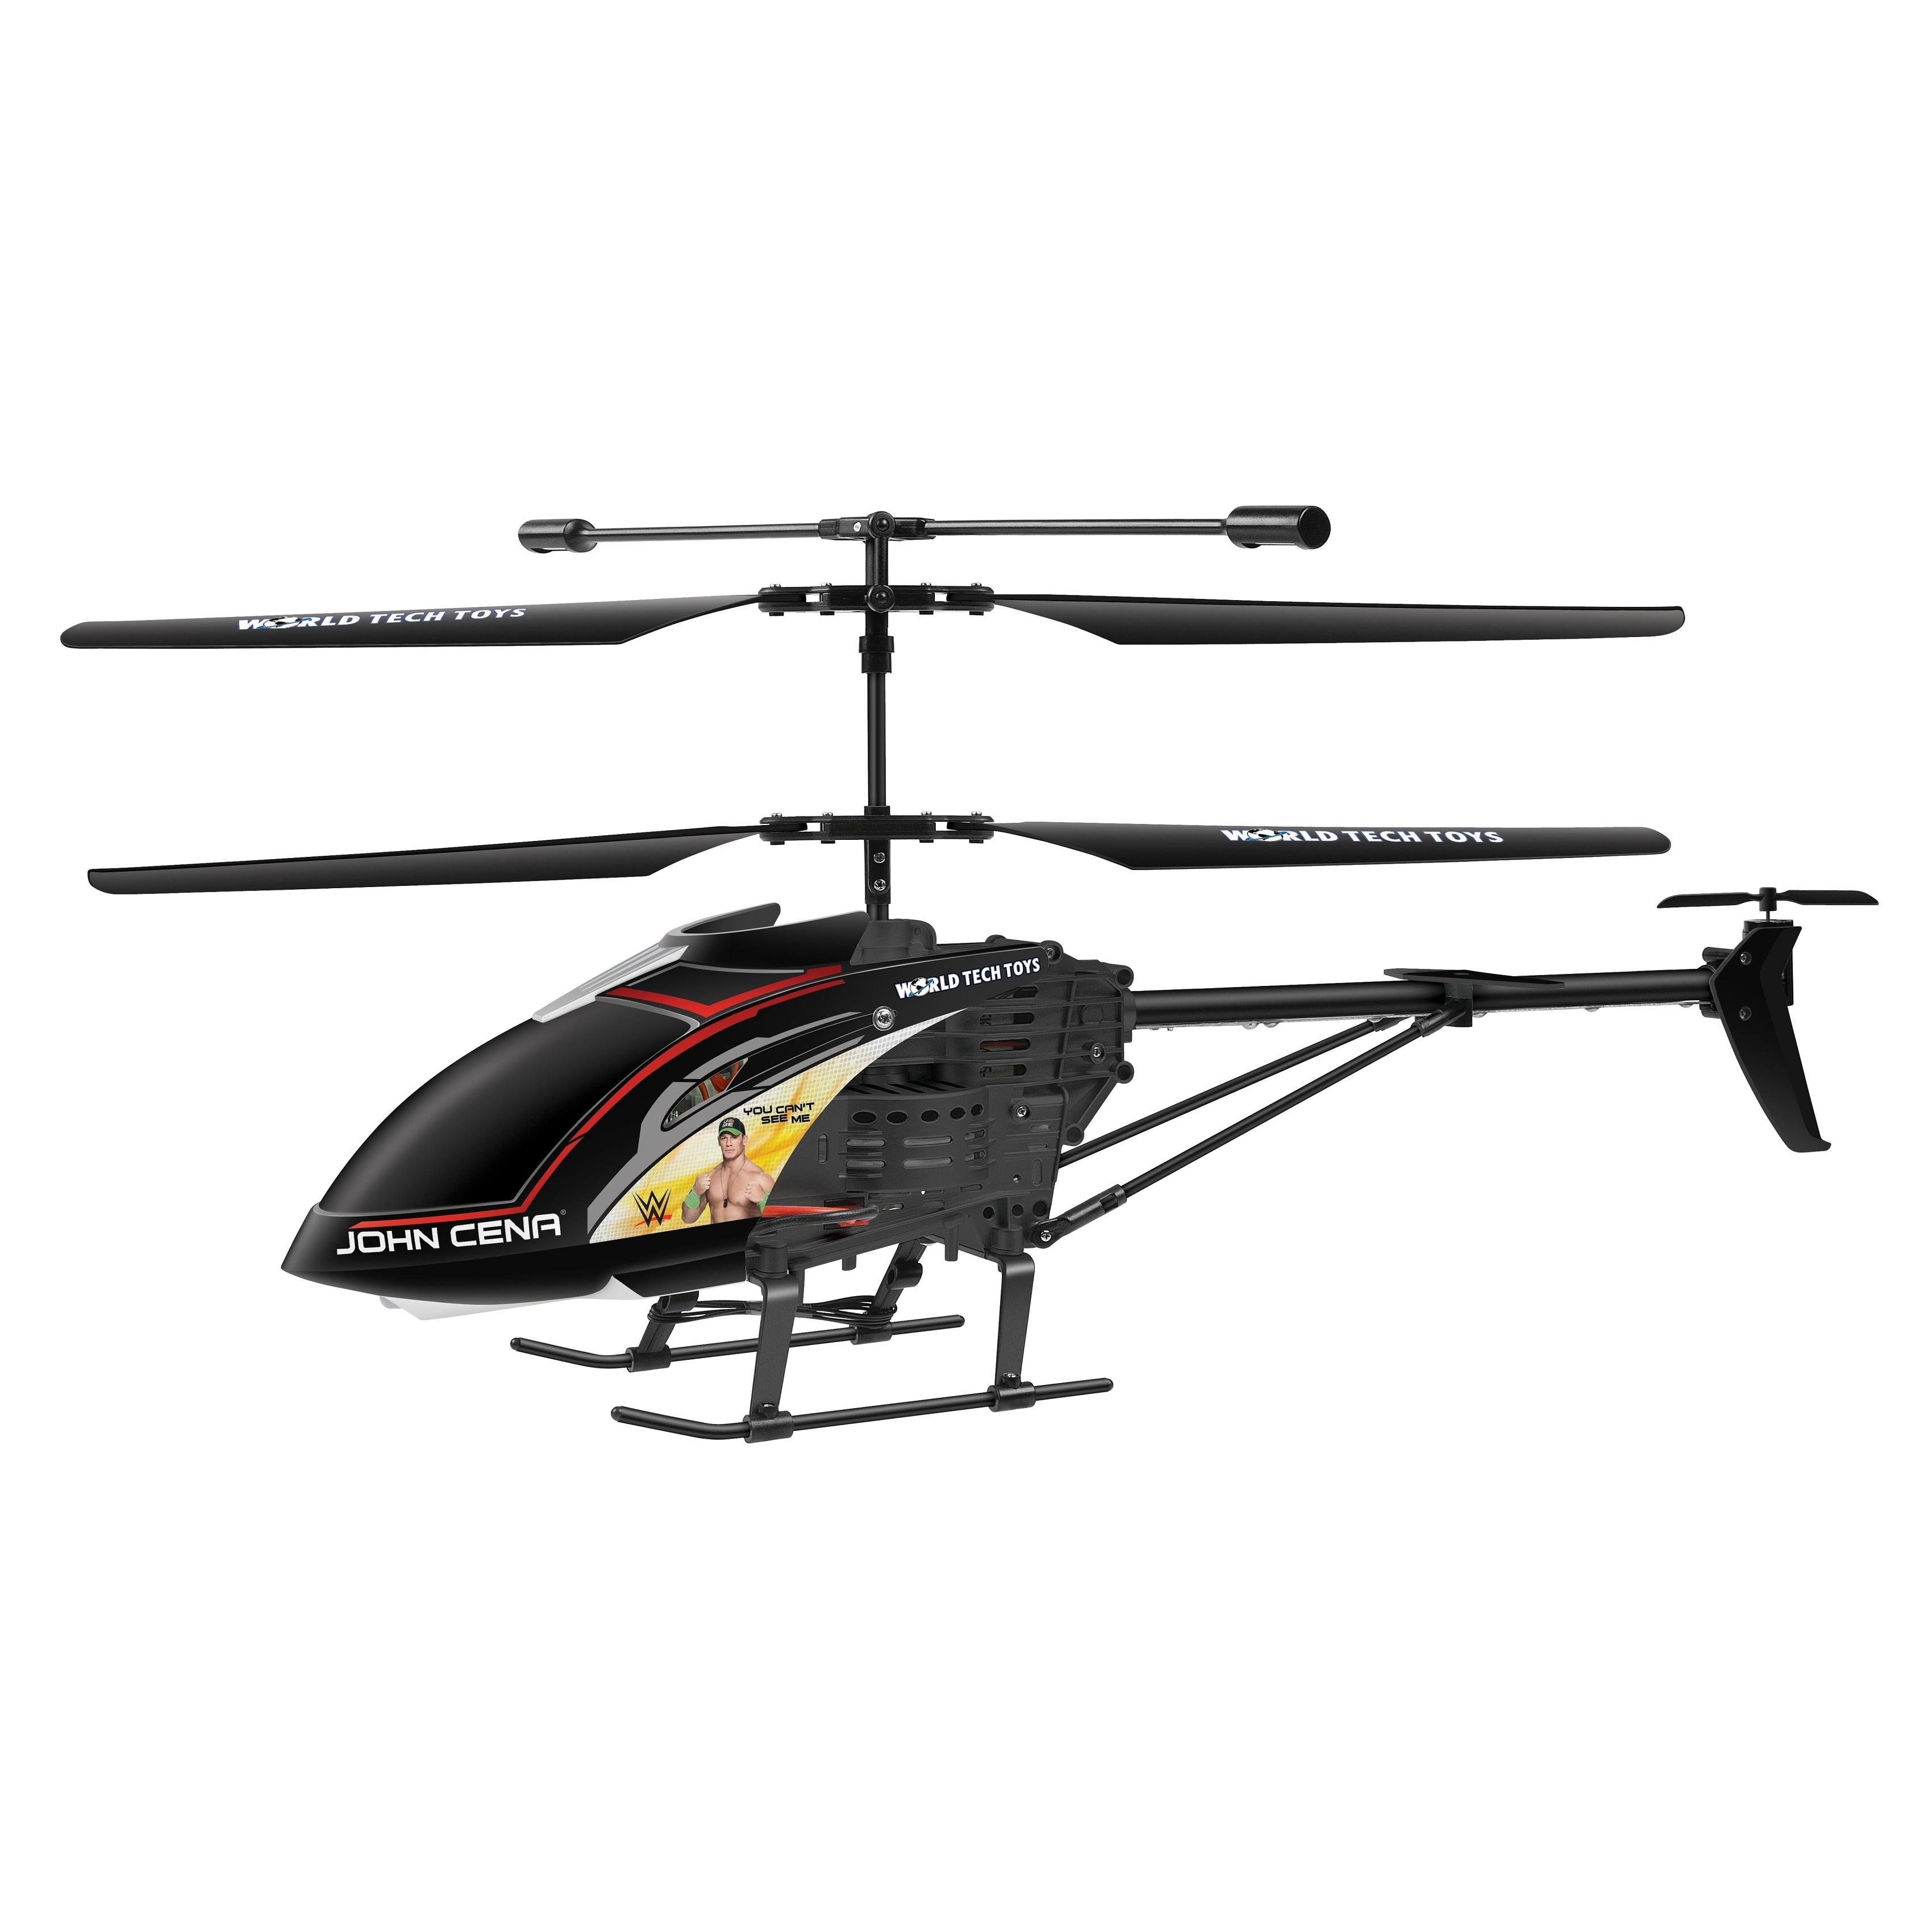 World Tech 3.5-channel Jon Cena RC Gyro Helicopter (Jon C...